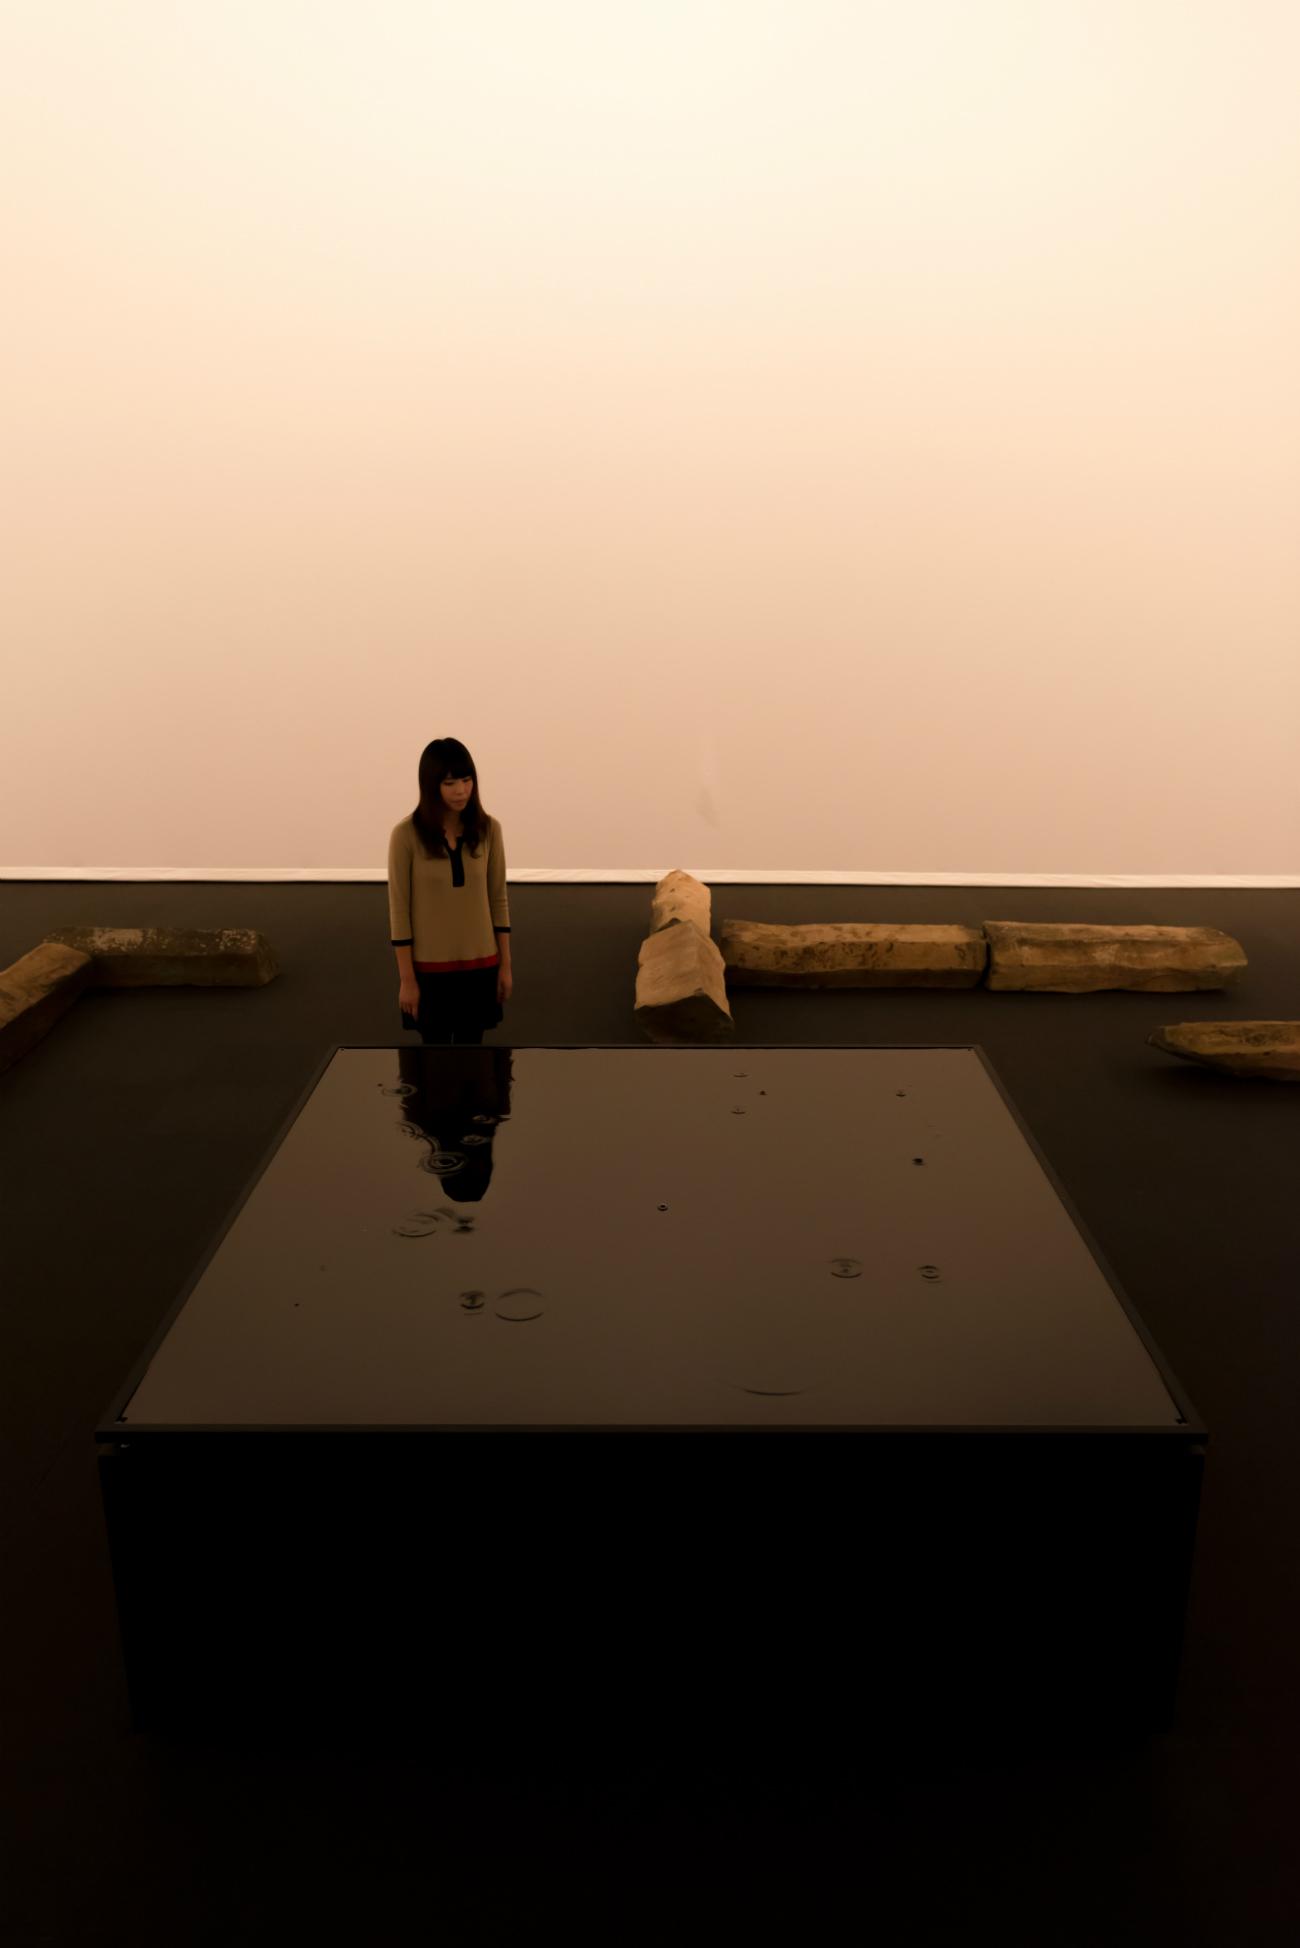 出展作品:坂本龍一+高谷史郎「WATERSTATE 1(水の様態1)」2013年 撮影:丸尾隆一(YCAM)/写真提供:山口情報芸術センター[YCAM]